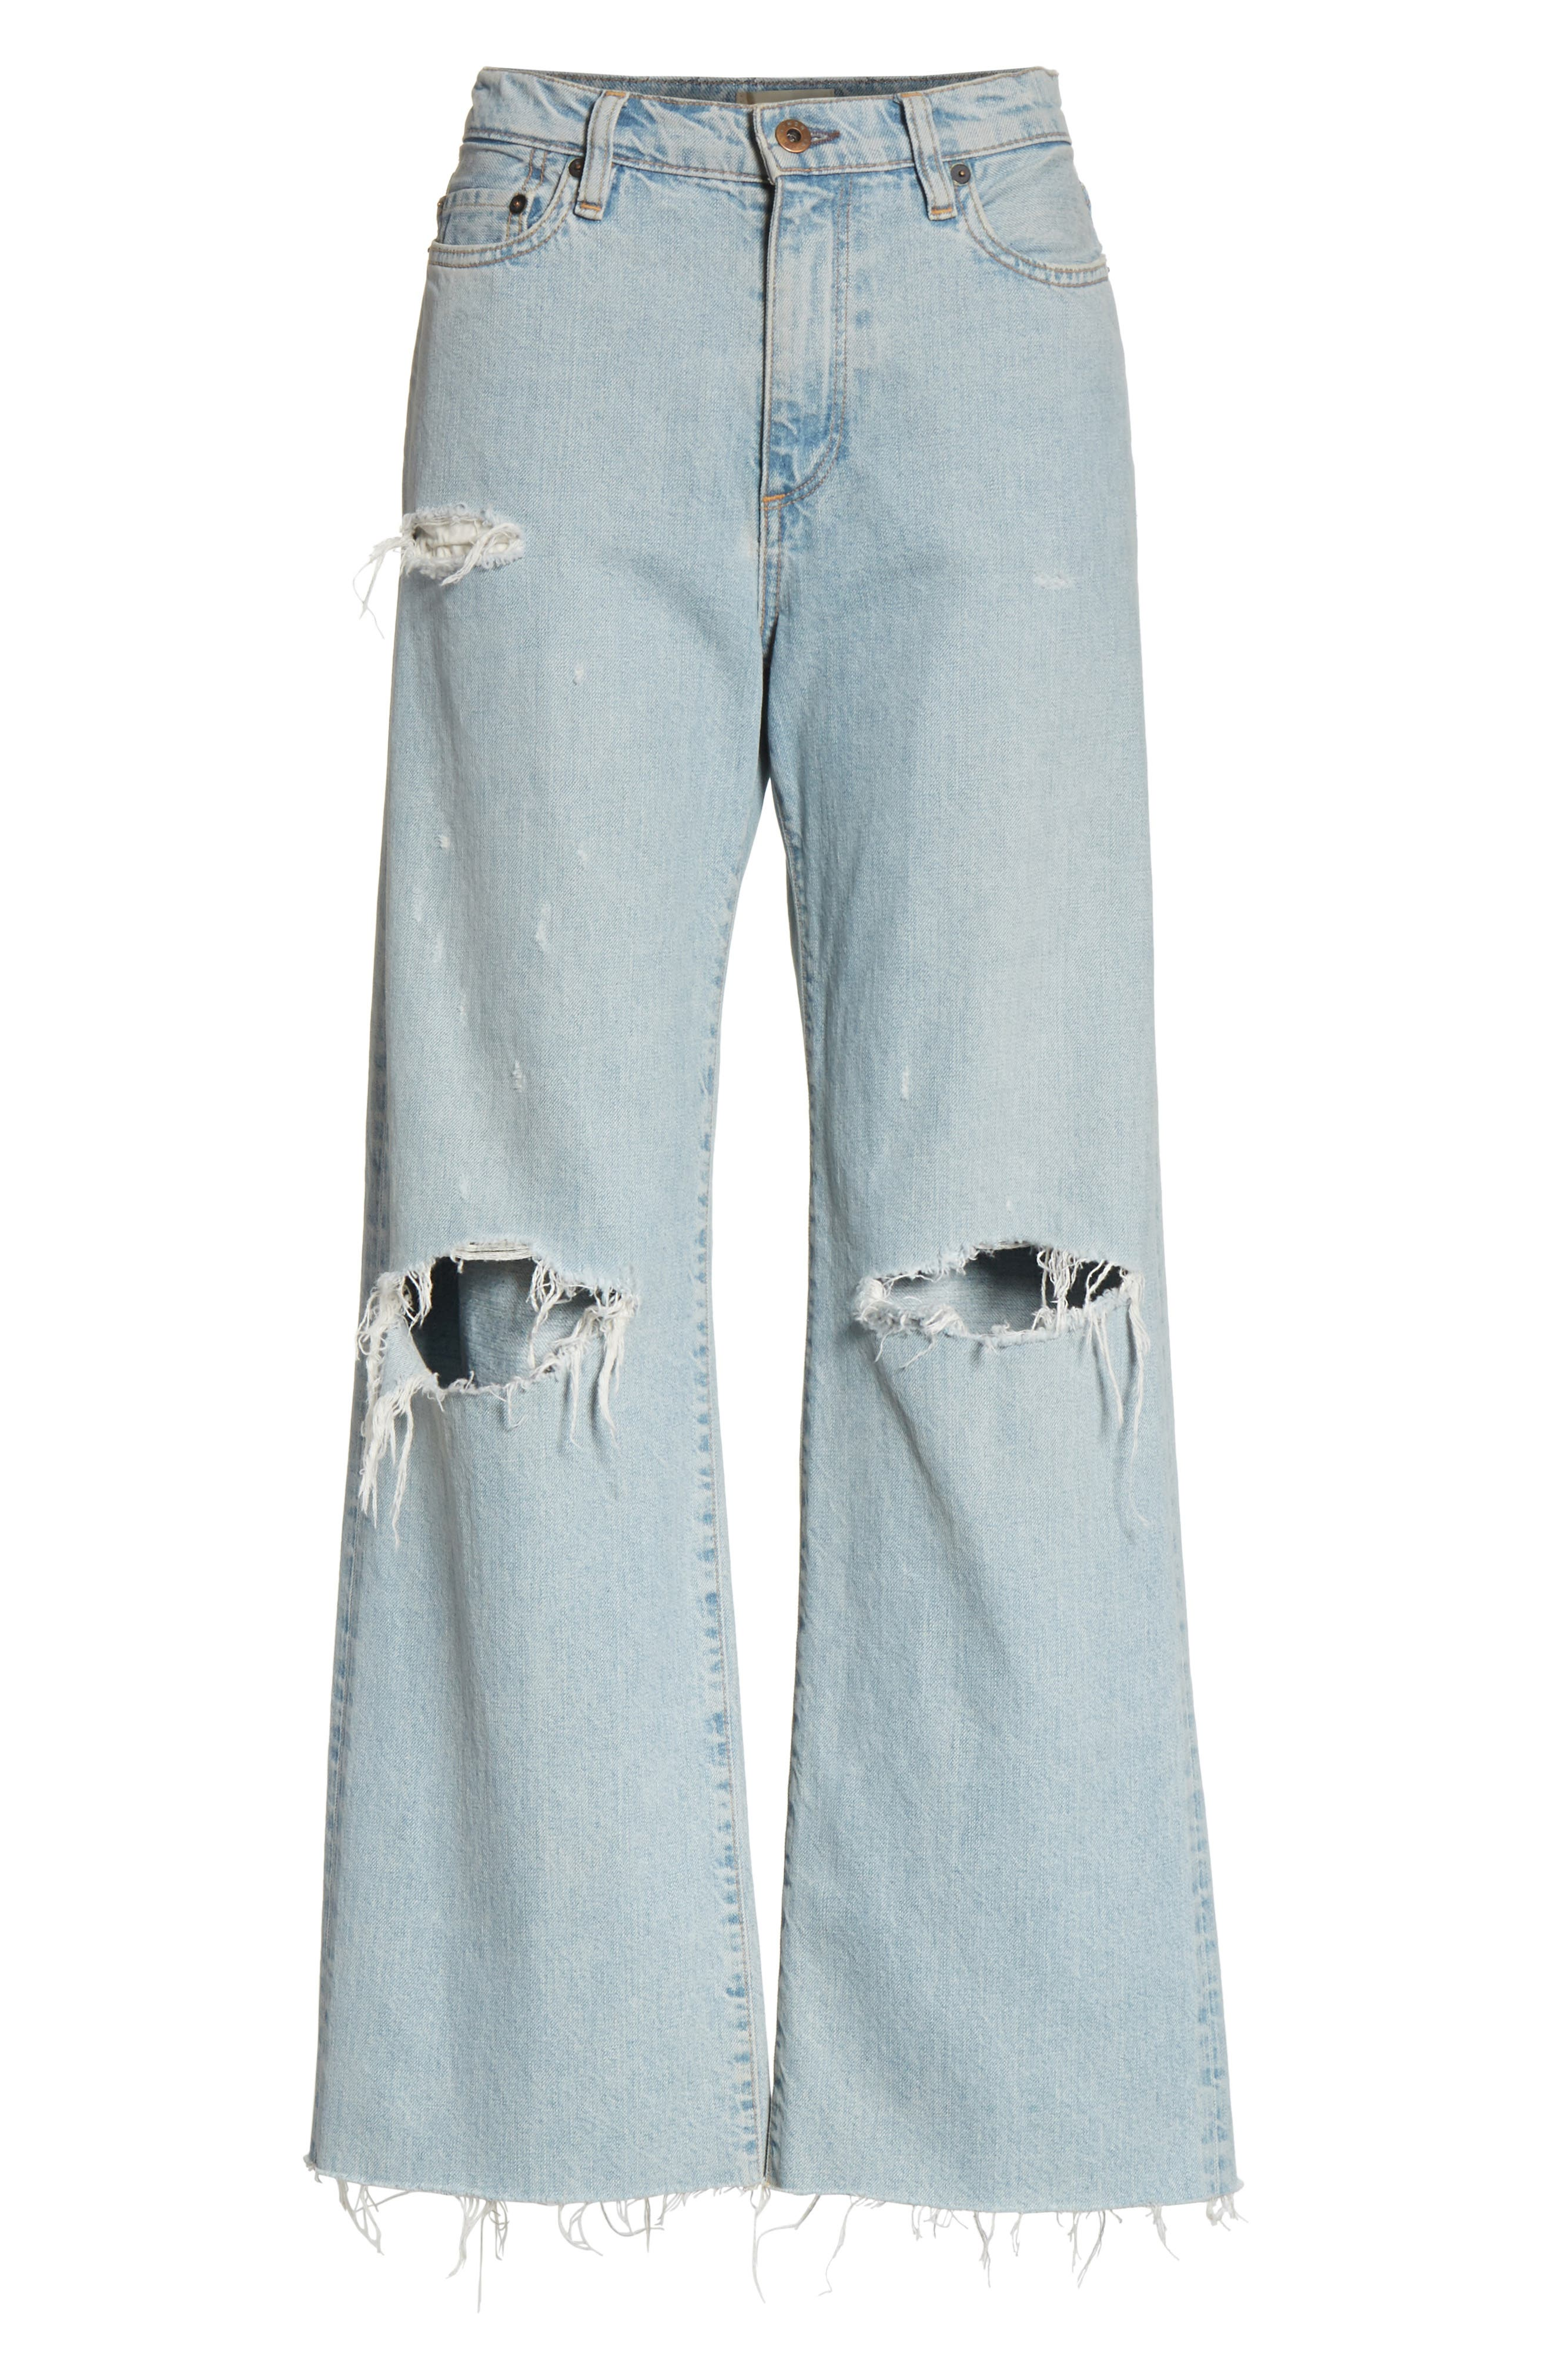 Tibbee Ripped Jeans,                             Alternate thumbnail 7, color,                             Light Indigo